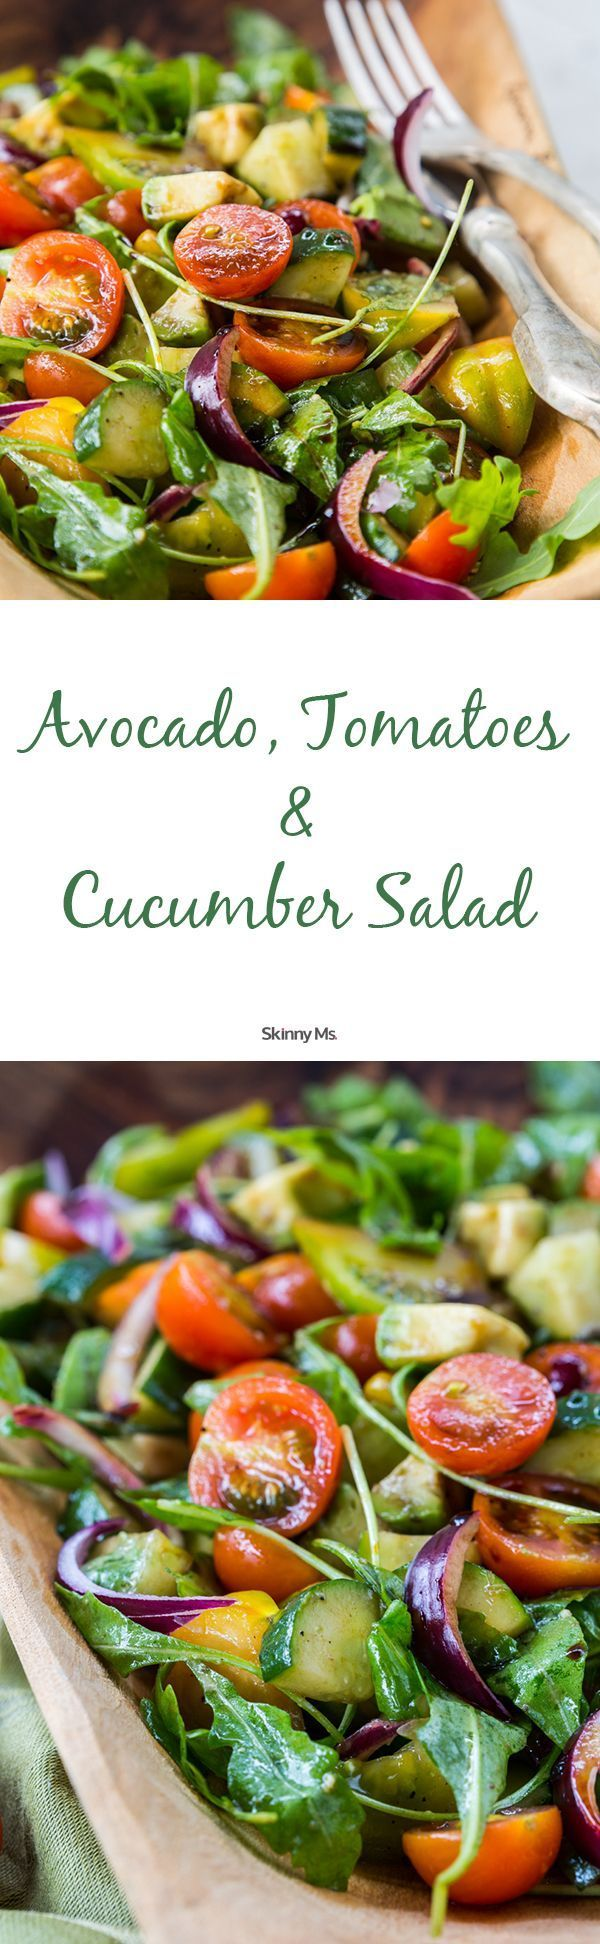 Avocado, Tomatoes & Cucumber Salad that takes only minutes to prepare! #avocado #tomatoes #cucumbersalad